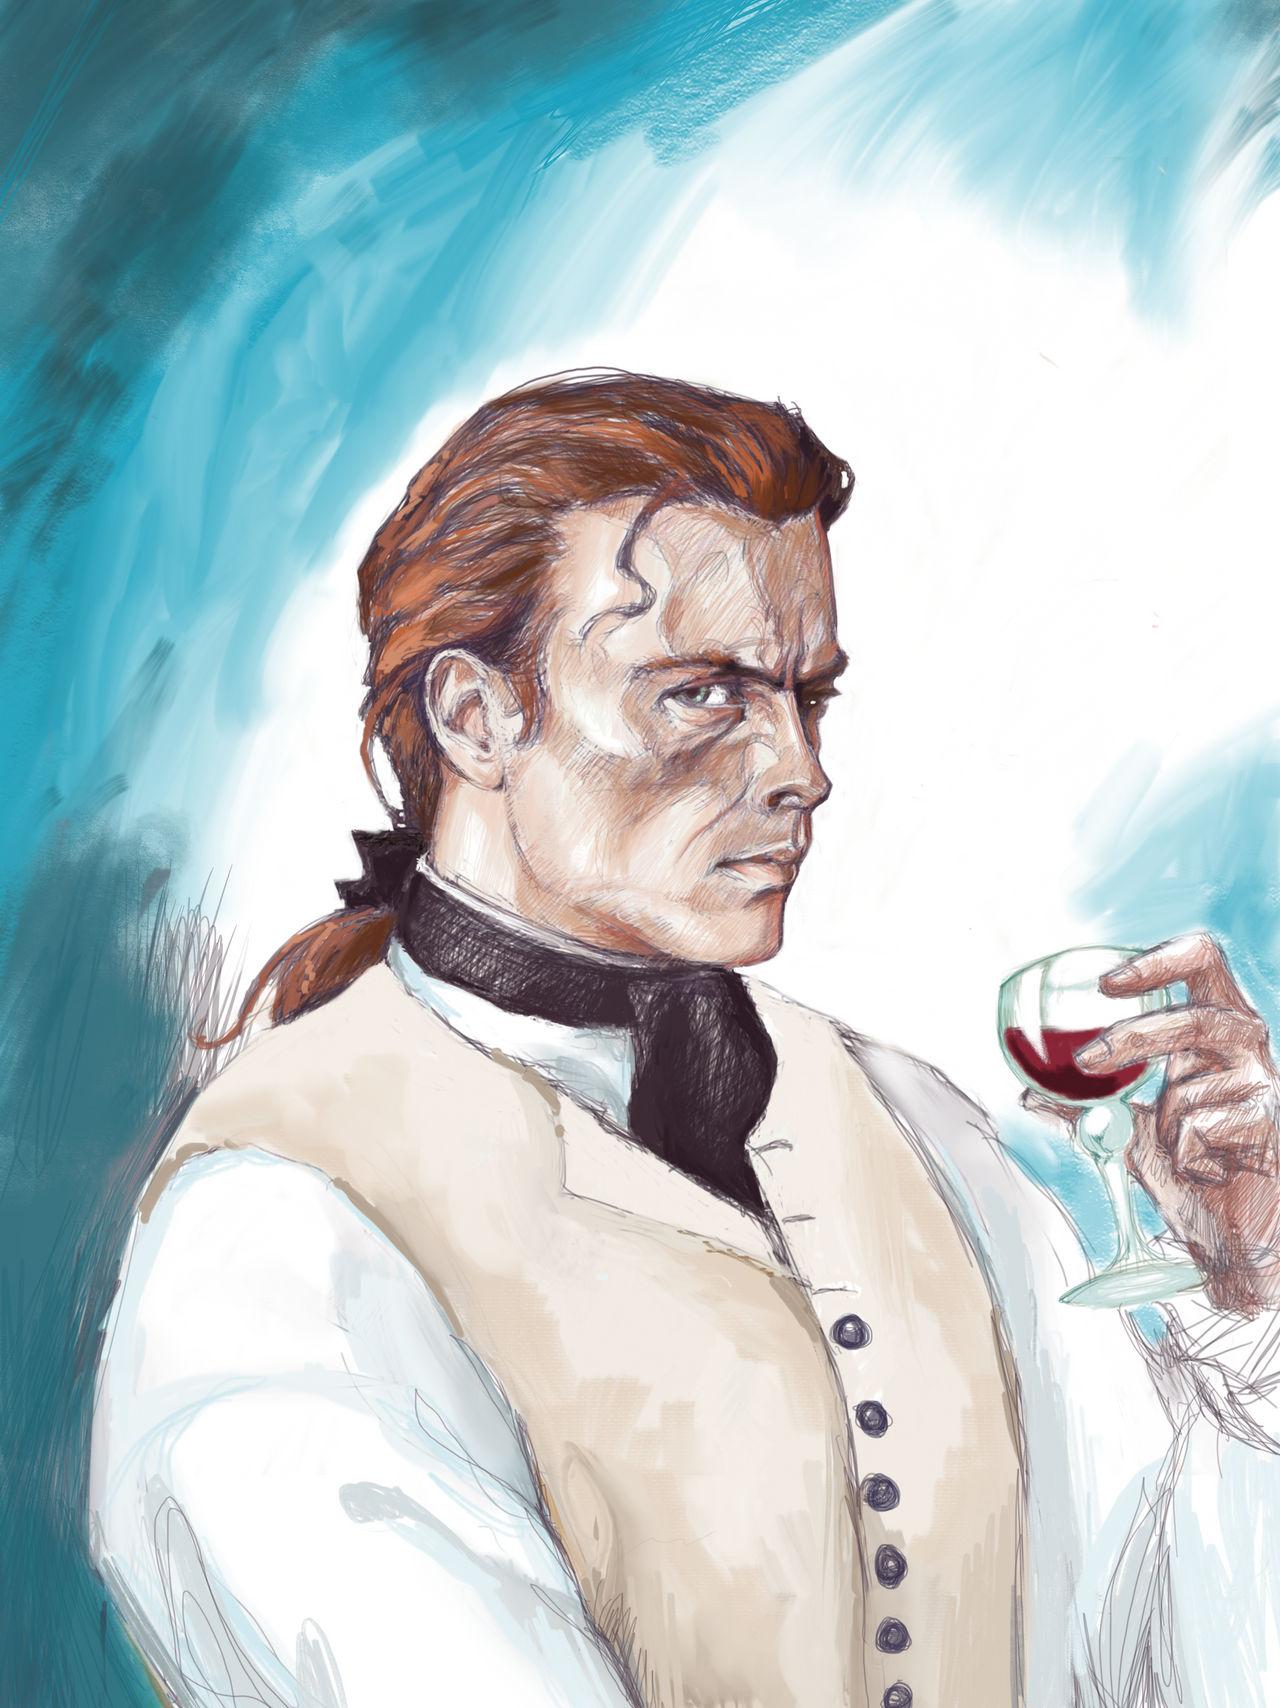 A Glass of Wine, Lieutenant?